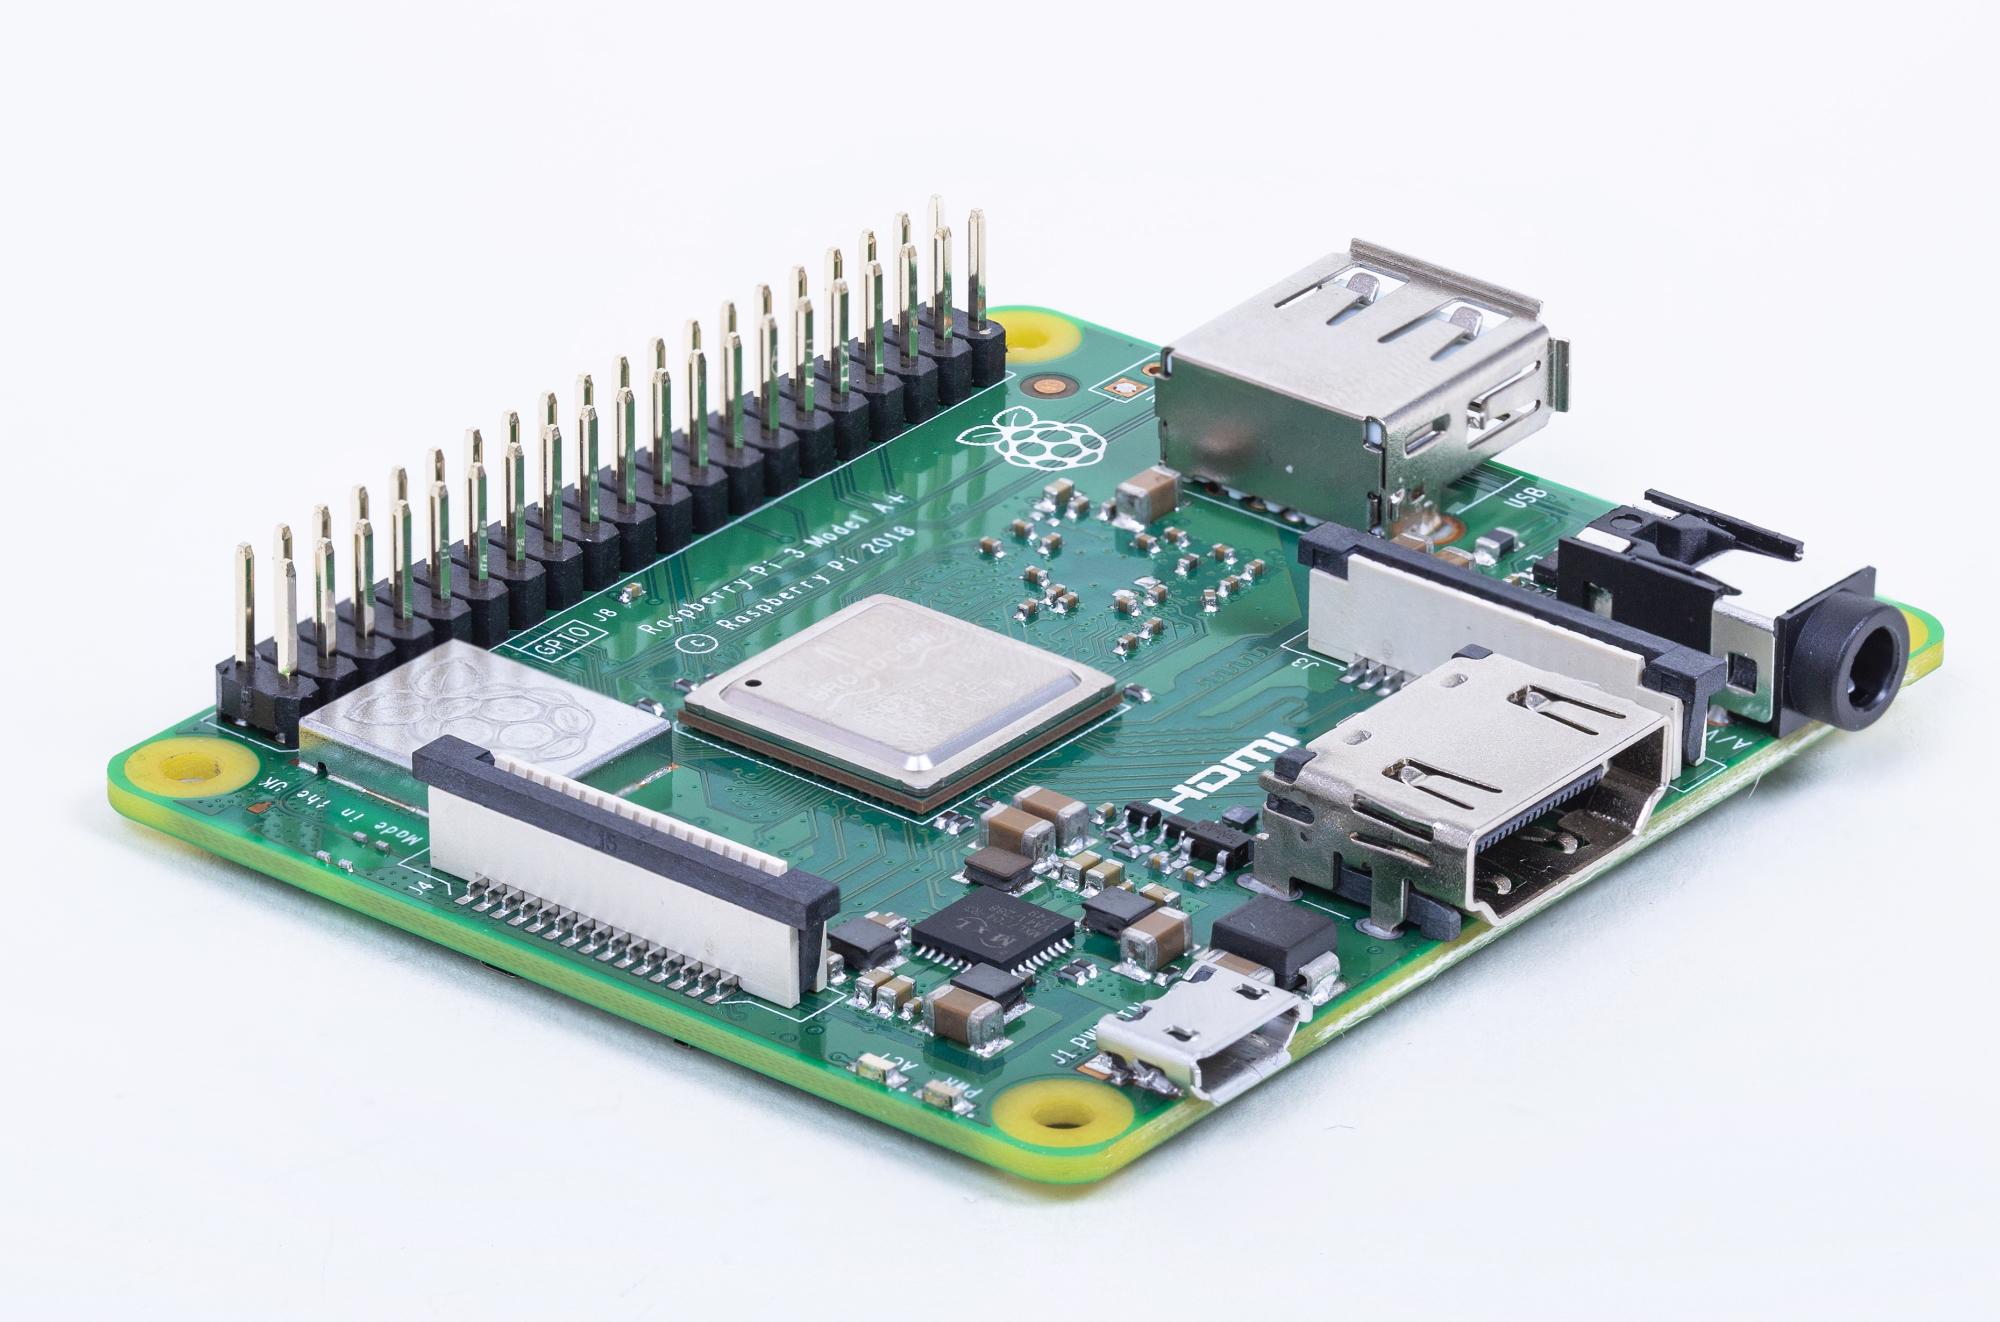 raspberry pi 3 b+ emulator performance